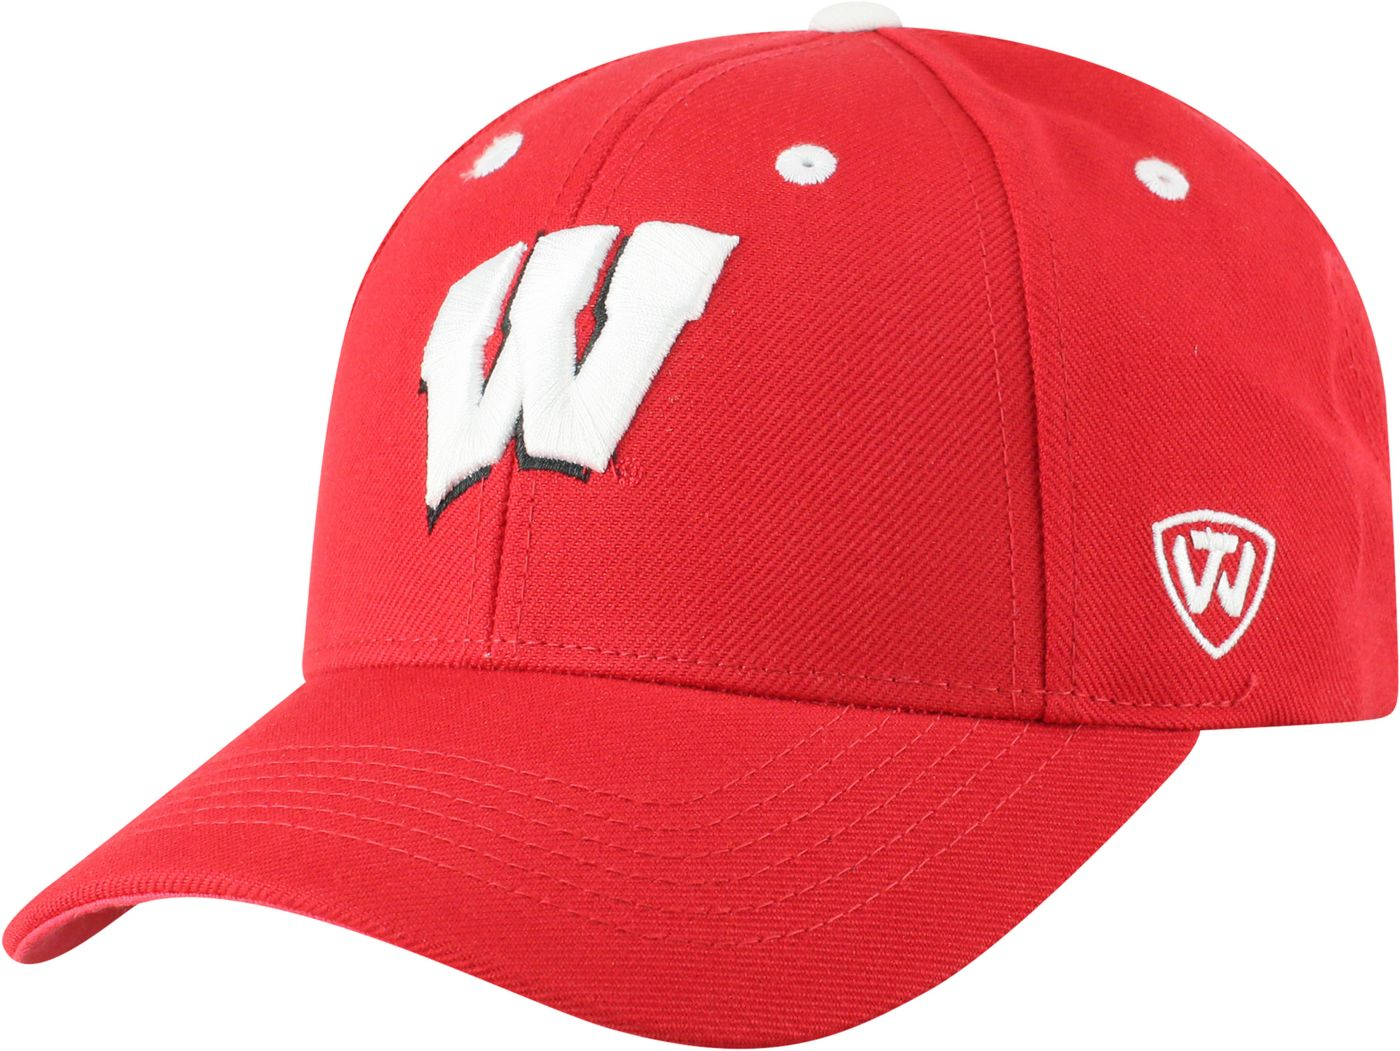 Top of the World Men's Wisconsin Badgers Red Triple Threat Adjustable Hat